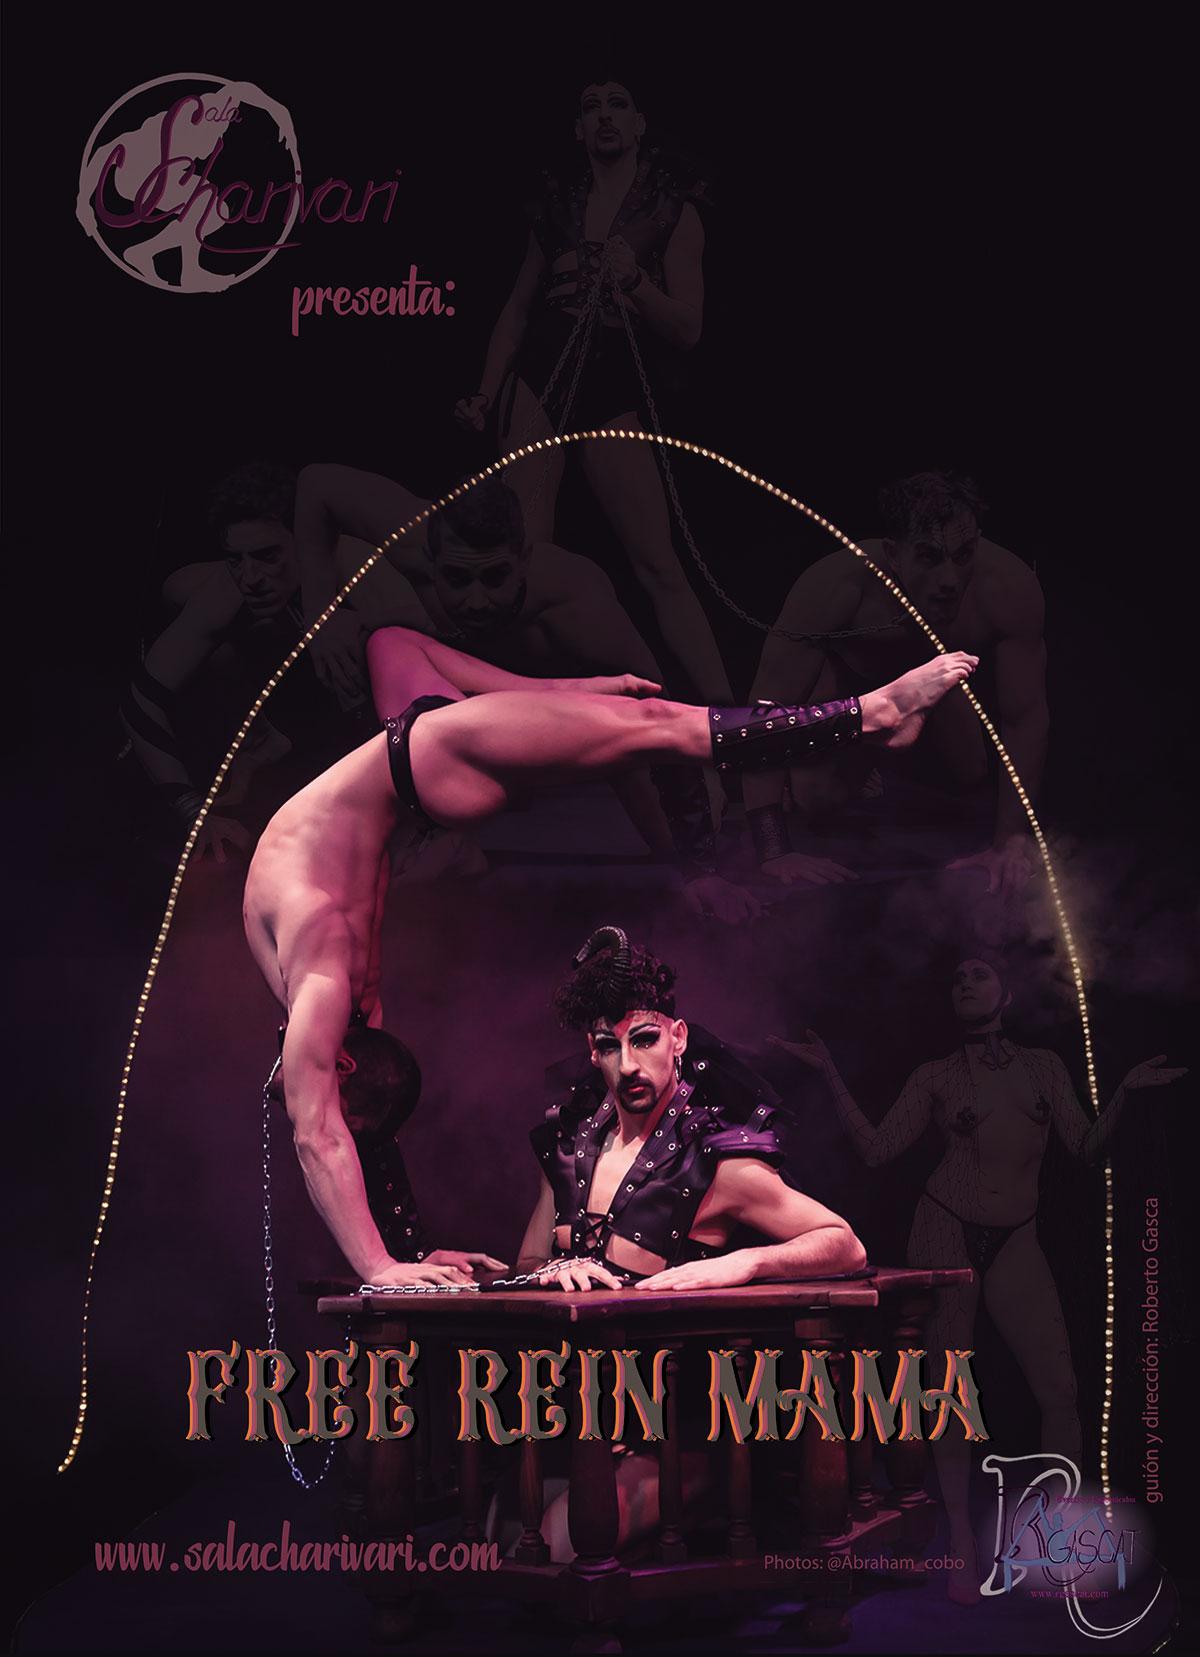 FREE REIN MAMA